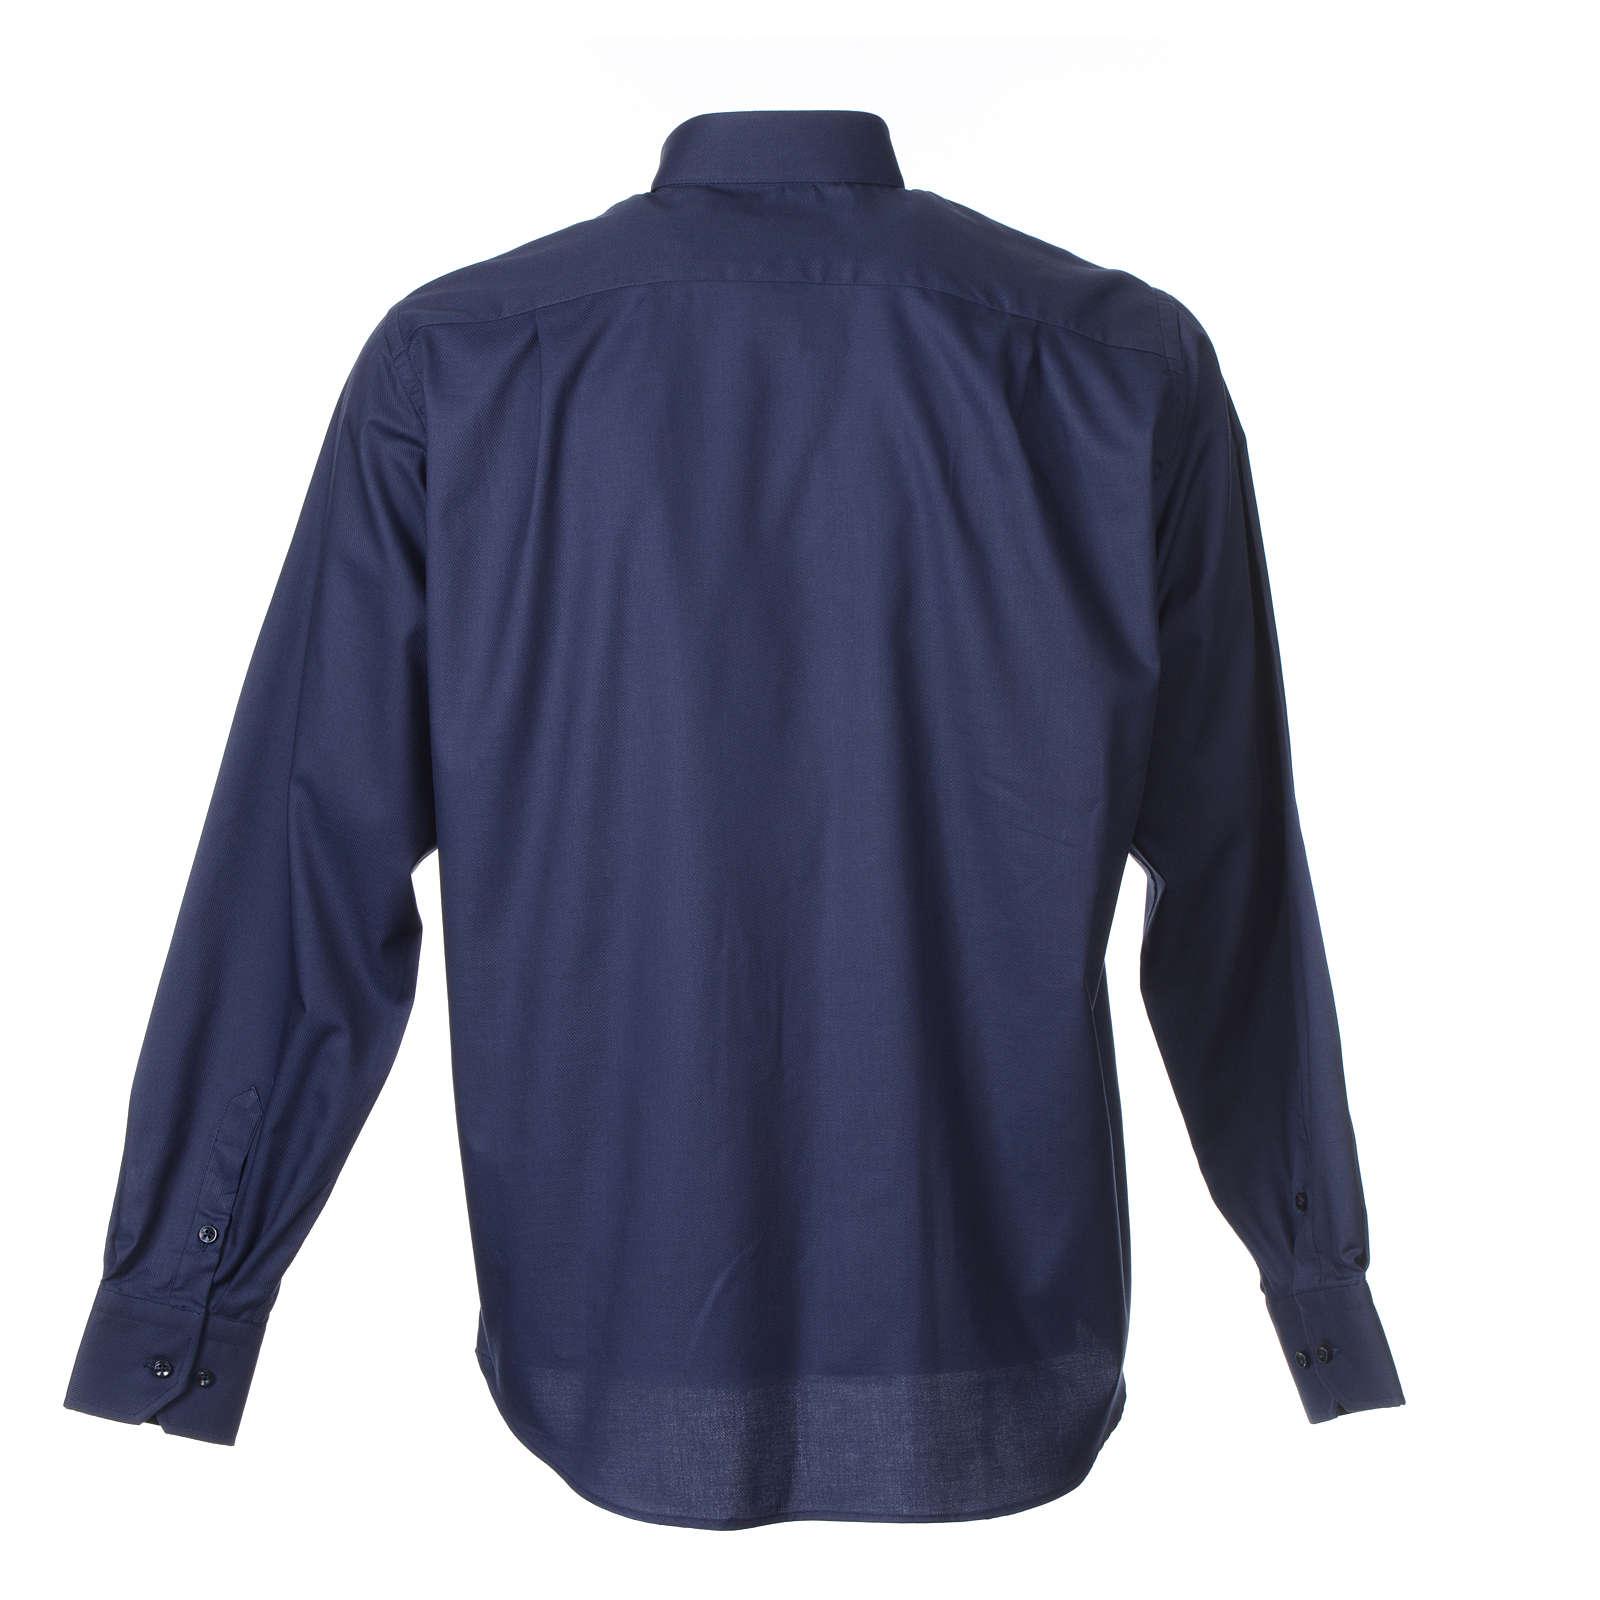 Camicia clergy M. Lunga Facile stiro Diagonale Misto cotone Blu 4